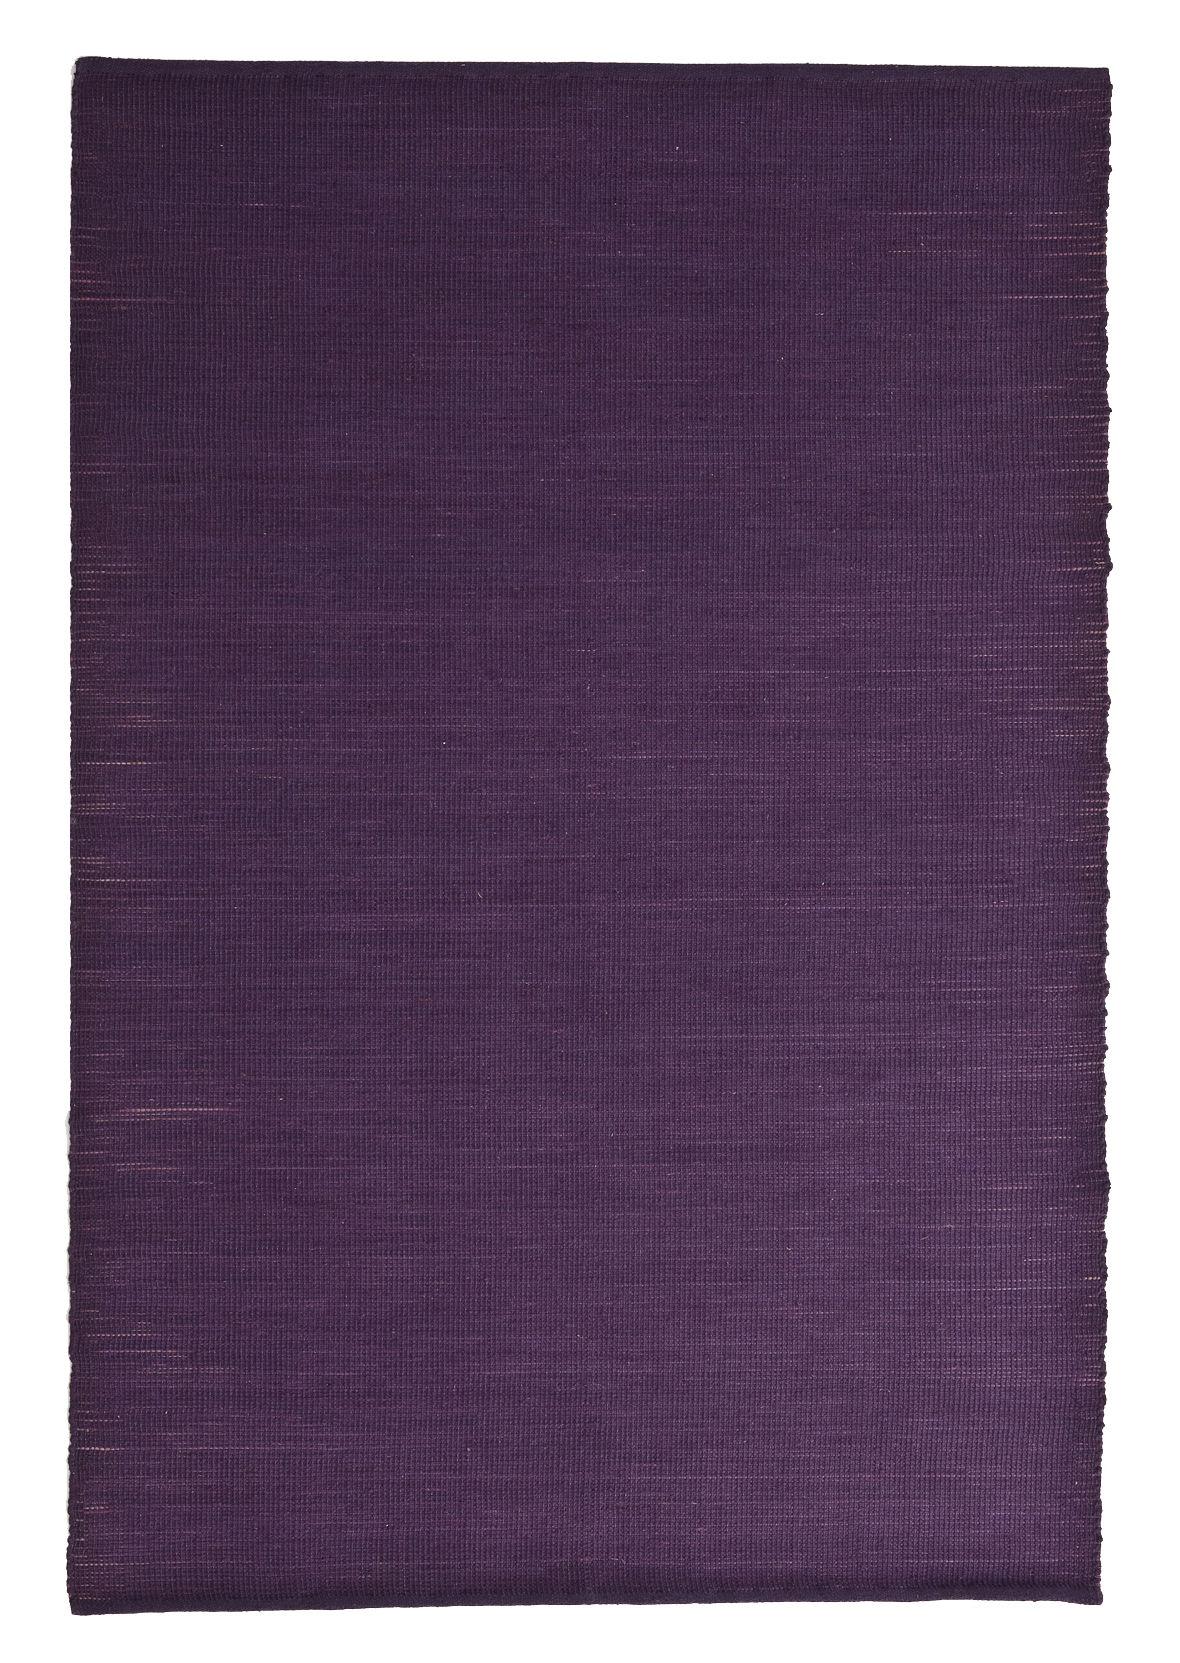 Dekoration - Teppiche - Natural Tatami Teppich / Jute und Wolle - 170 x 240 cm - Nanimarquina - Violett (uni) - Fibres de jute, Laine vierge